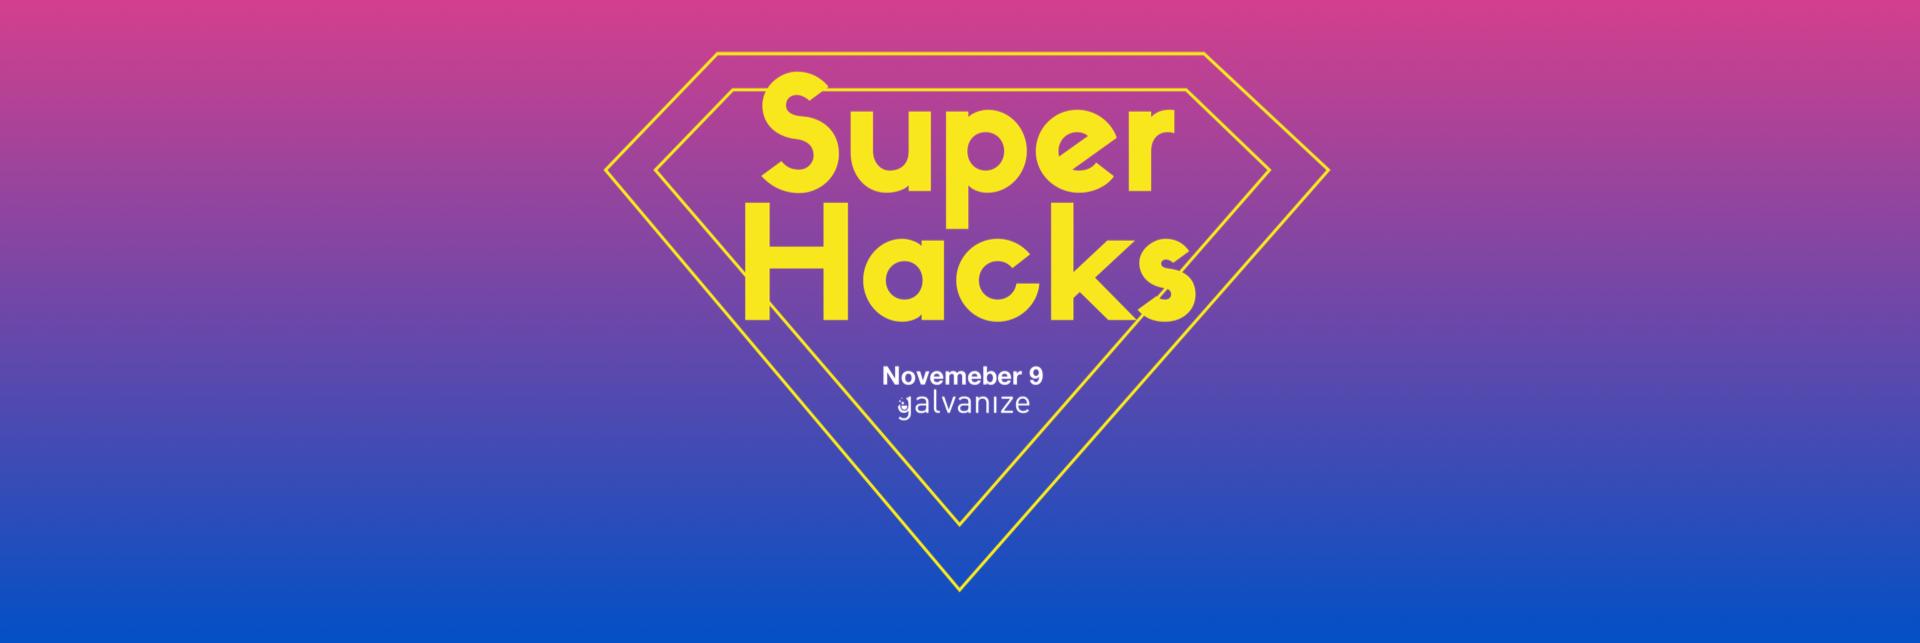 SuperHacks Web Strip.png